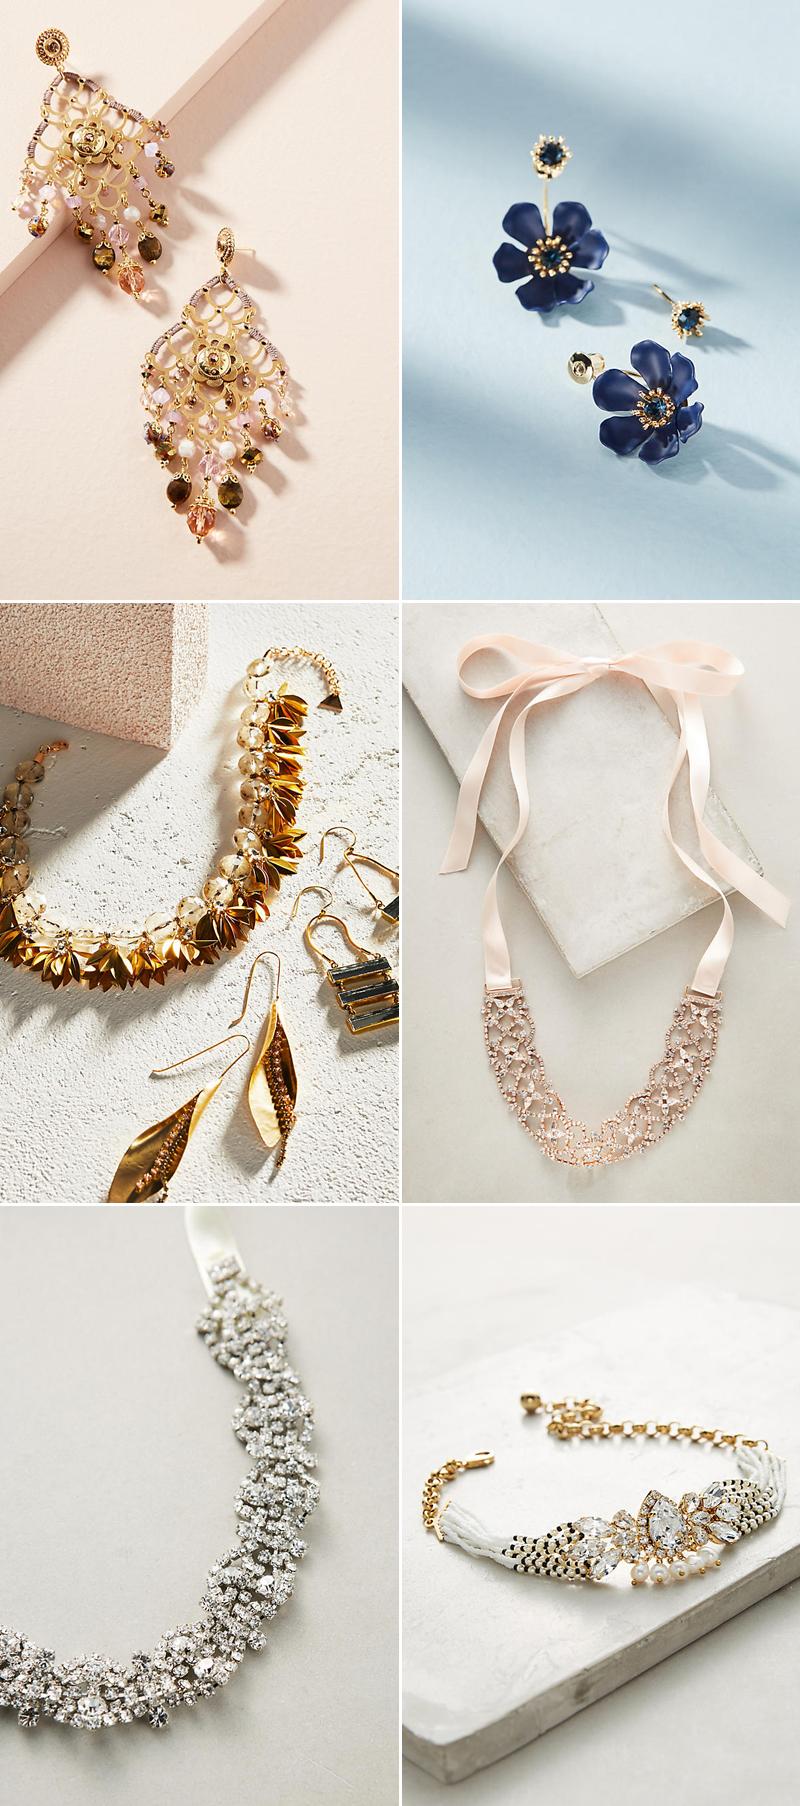 jewelry05-Anthropologie